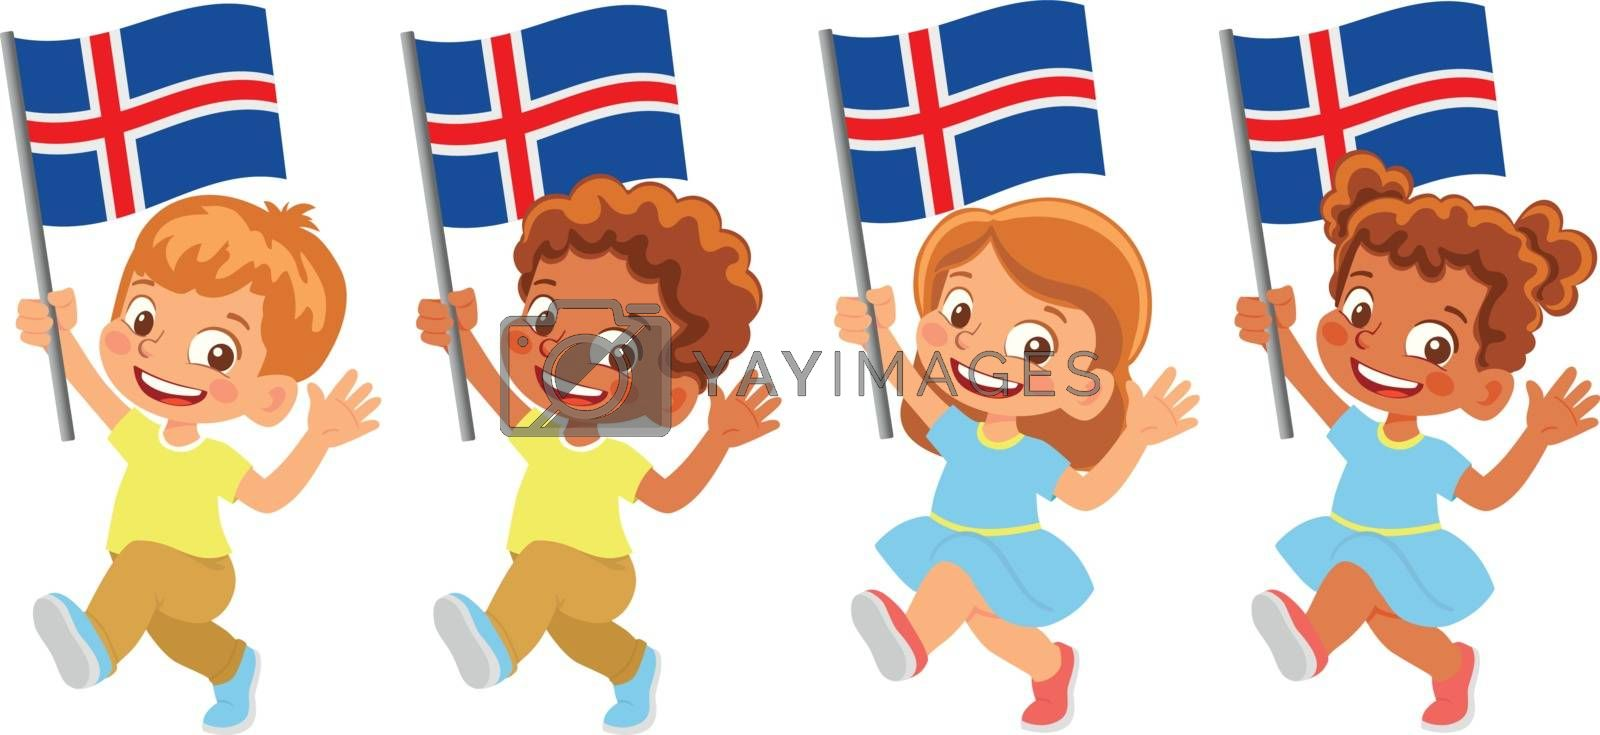 Iceland flag in hand. Children holding flag. National flag of Iceland vector